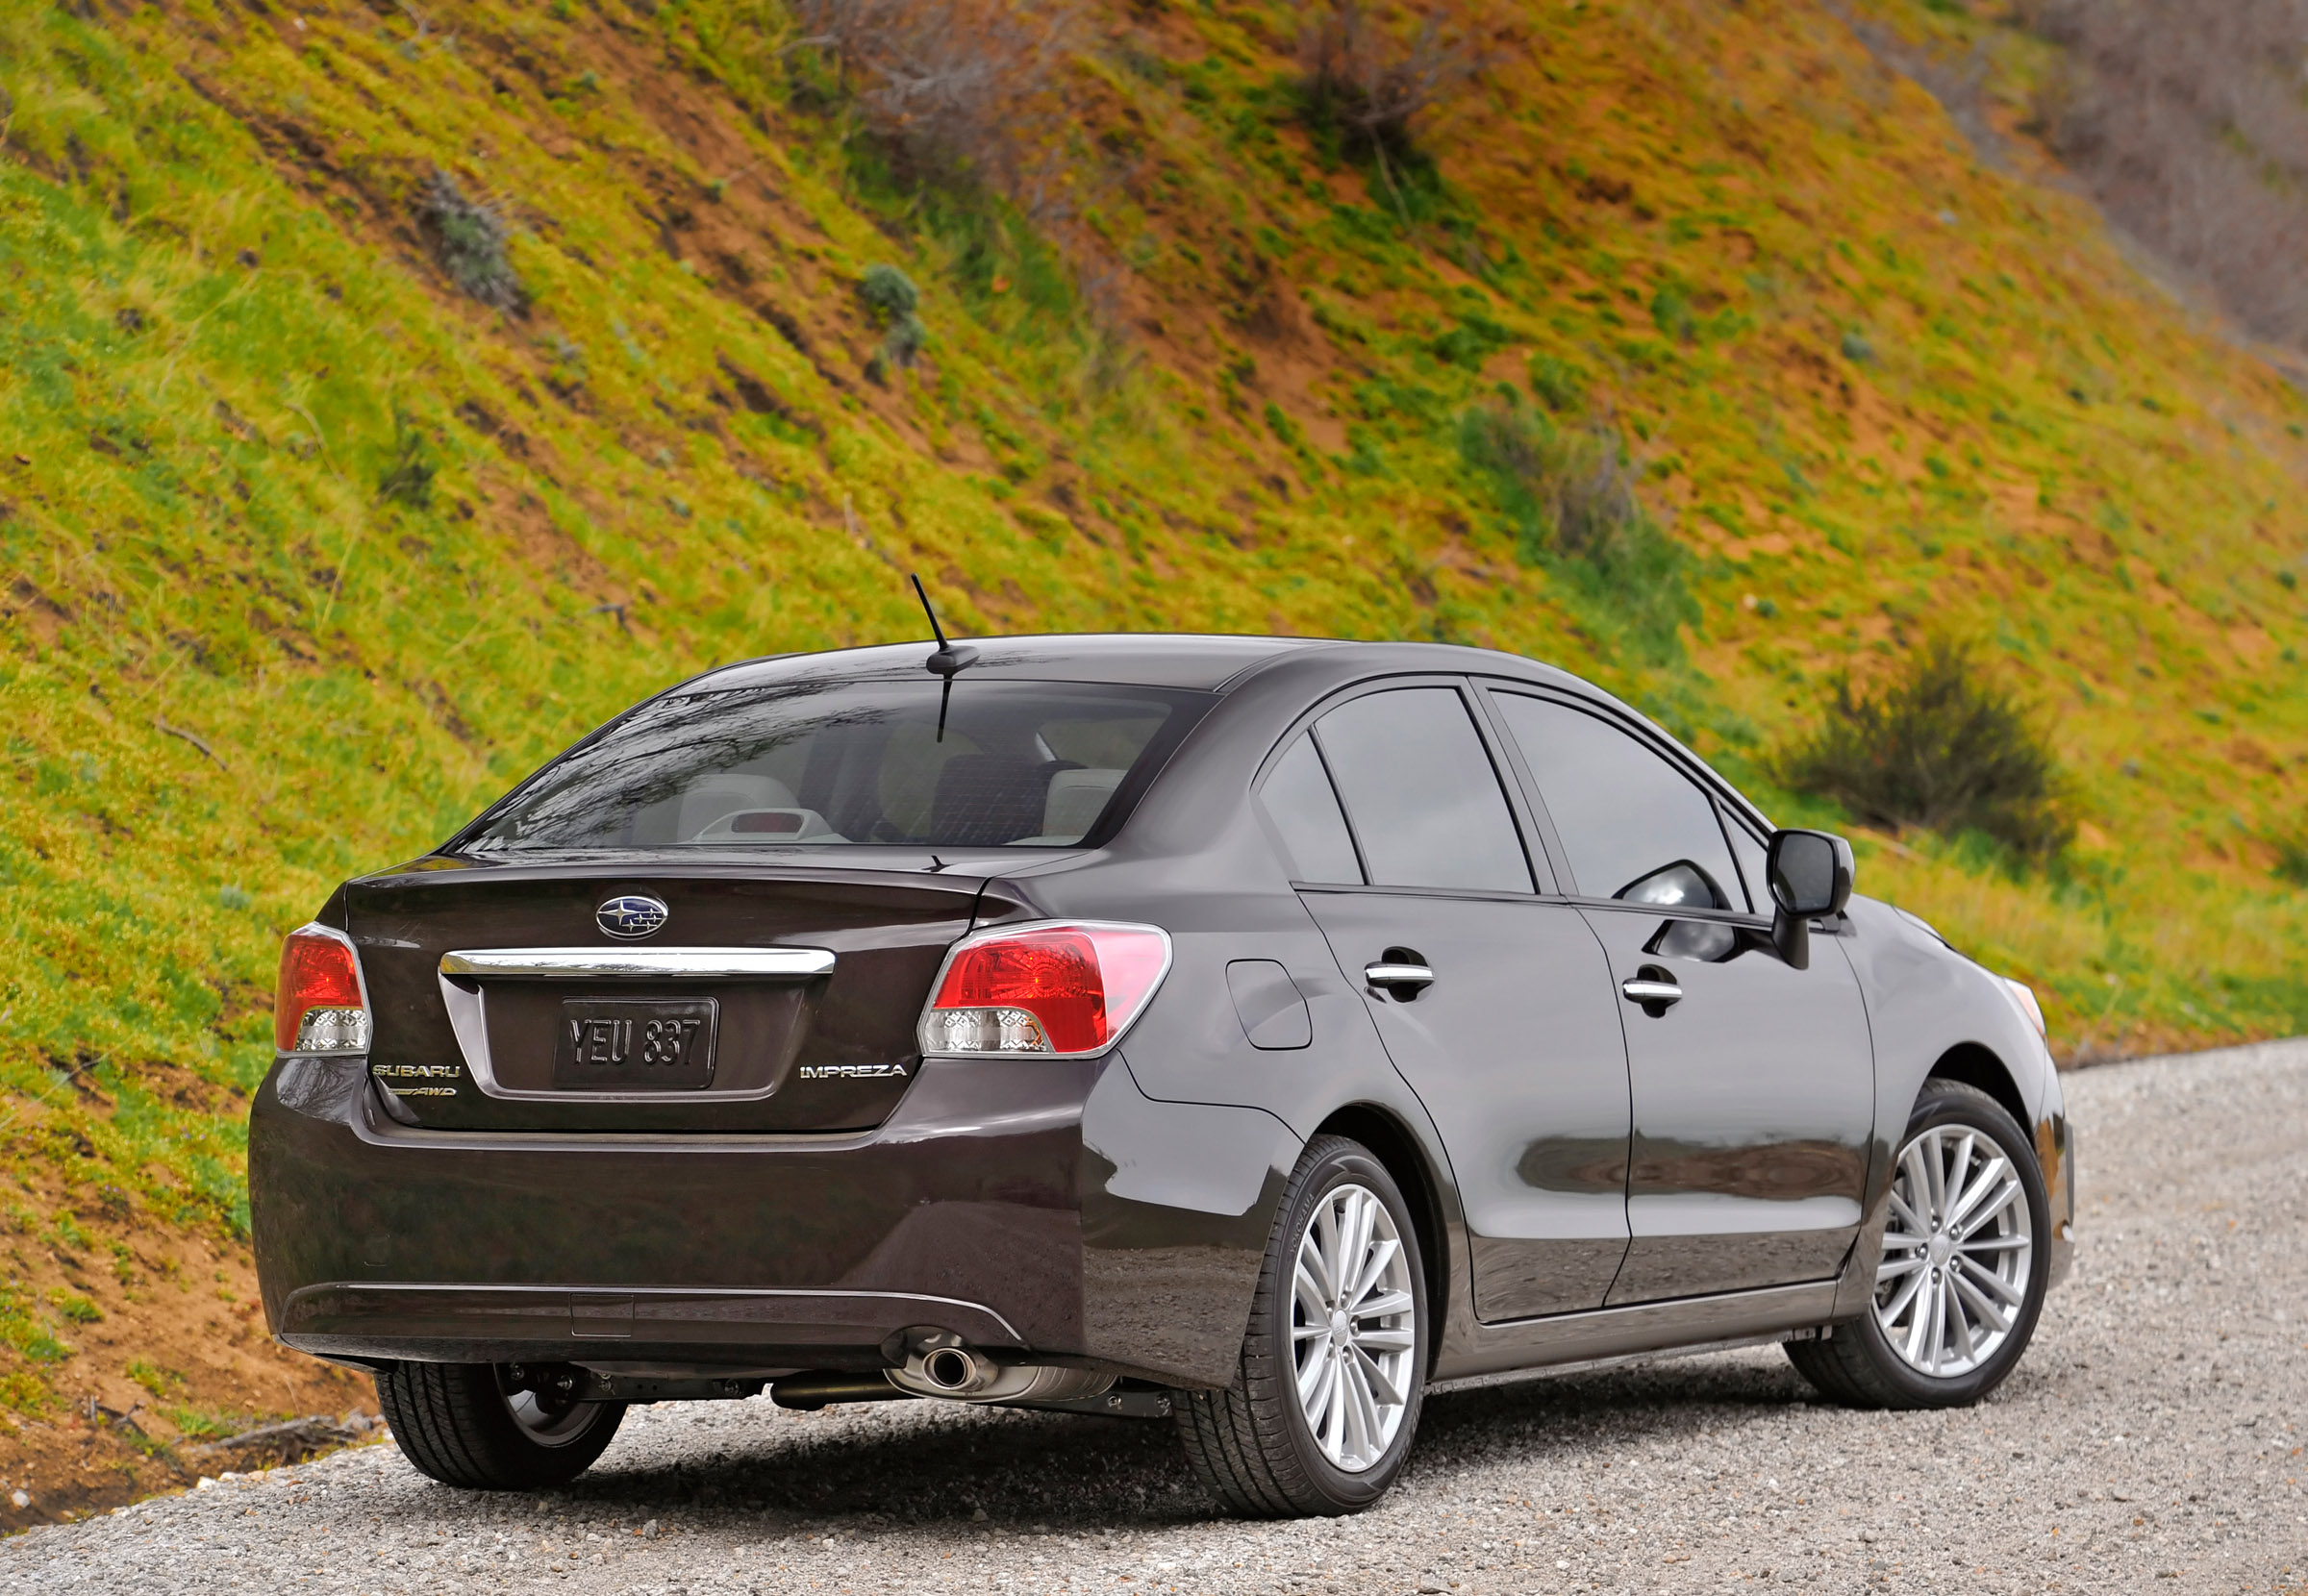 2012 - Subaru Impreza 2-0i лимитированная четвертая версия (фотографии) - фотография №8